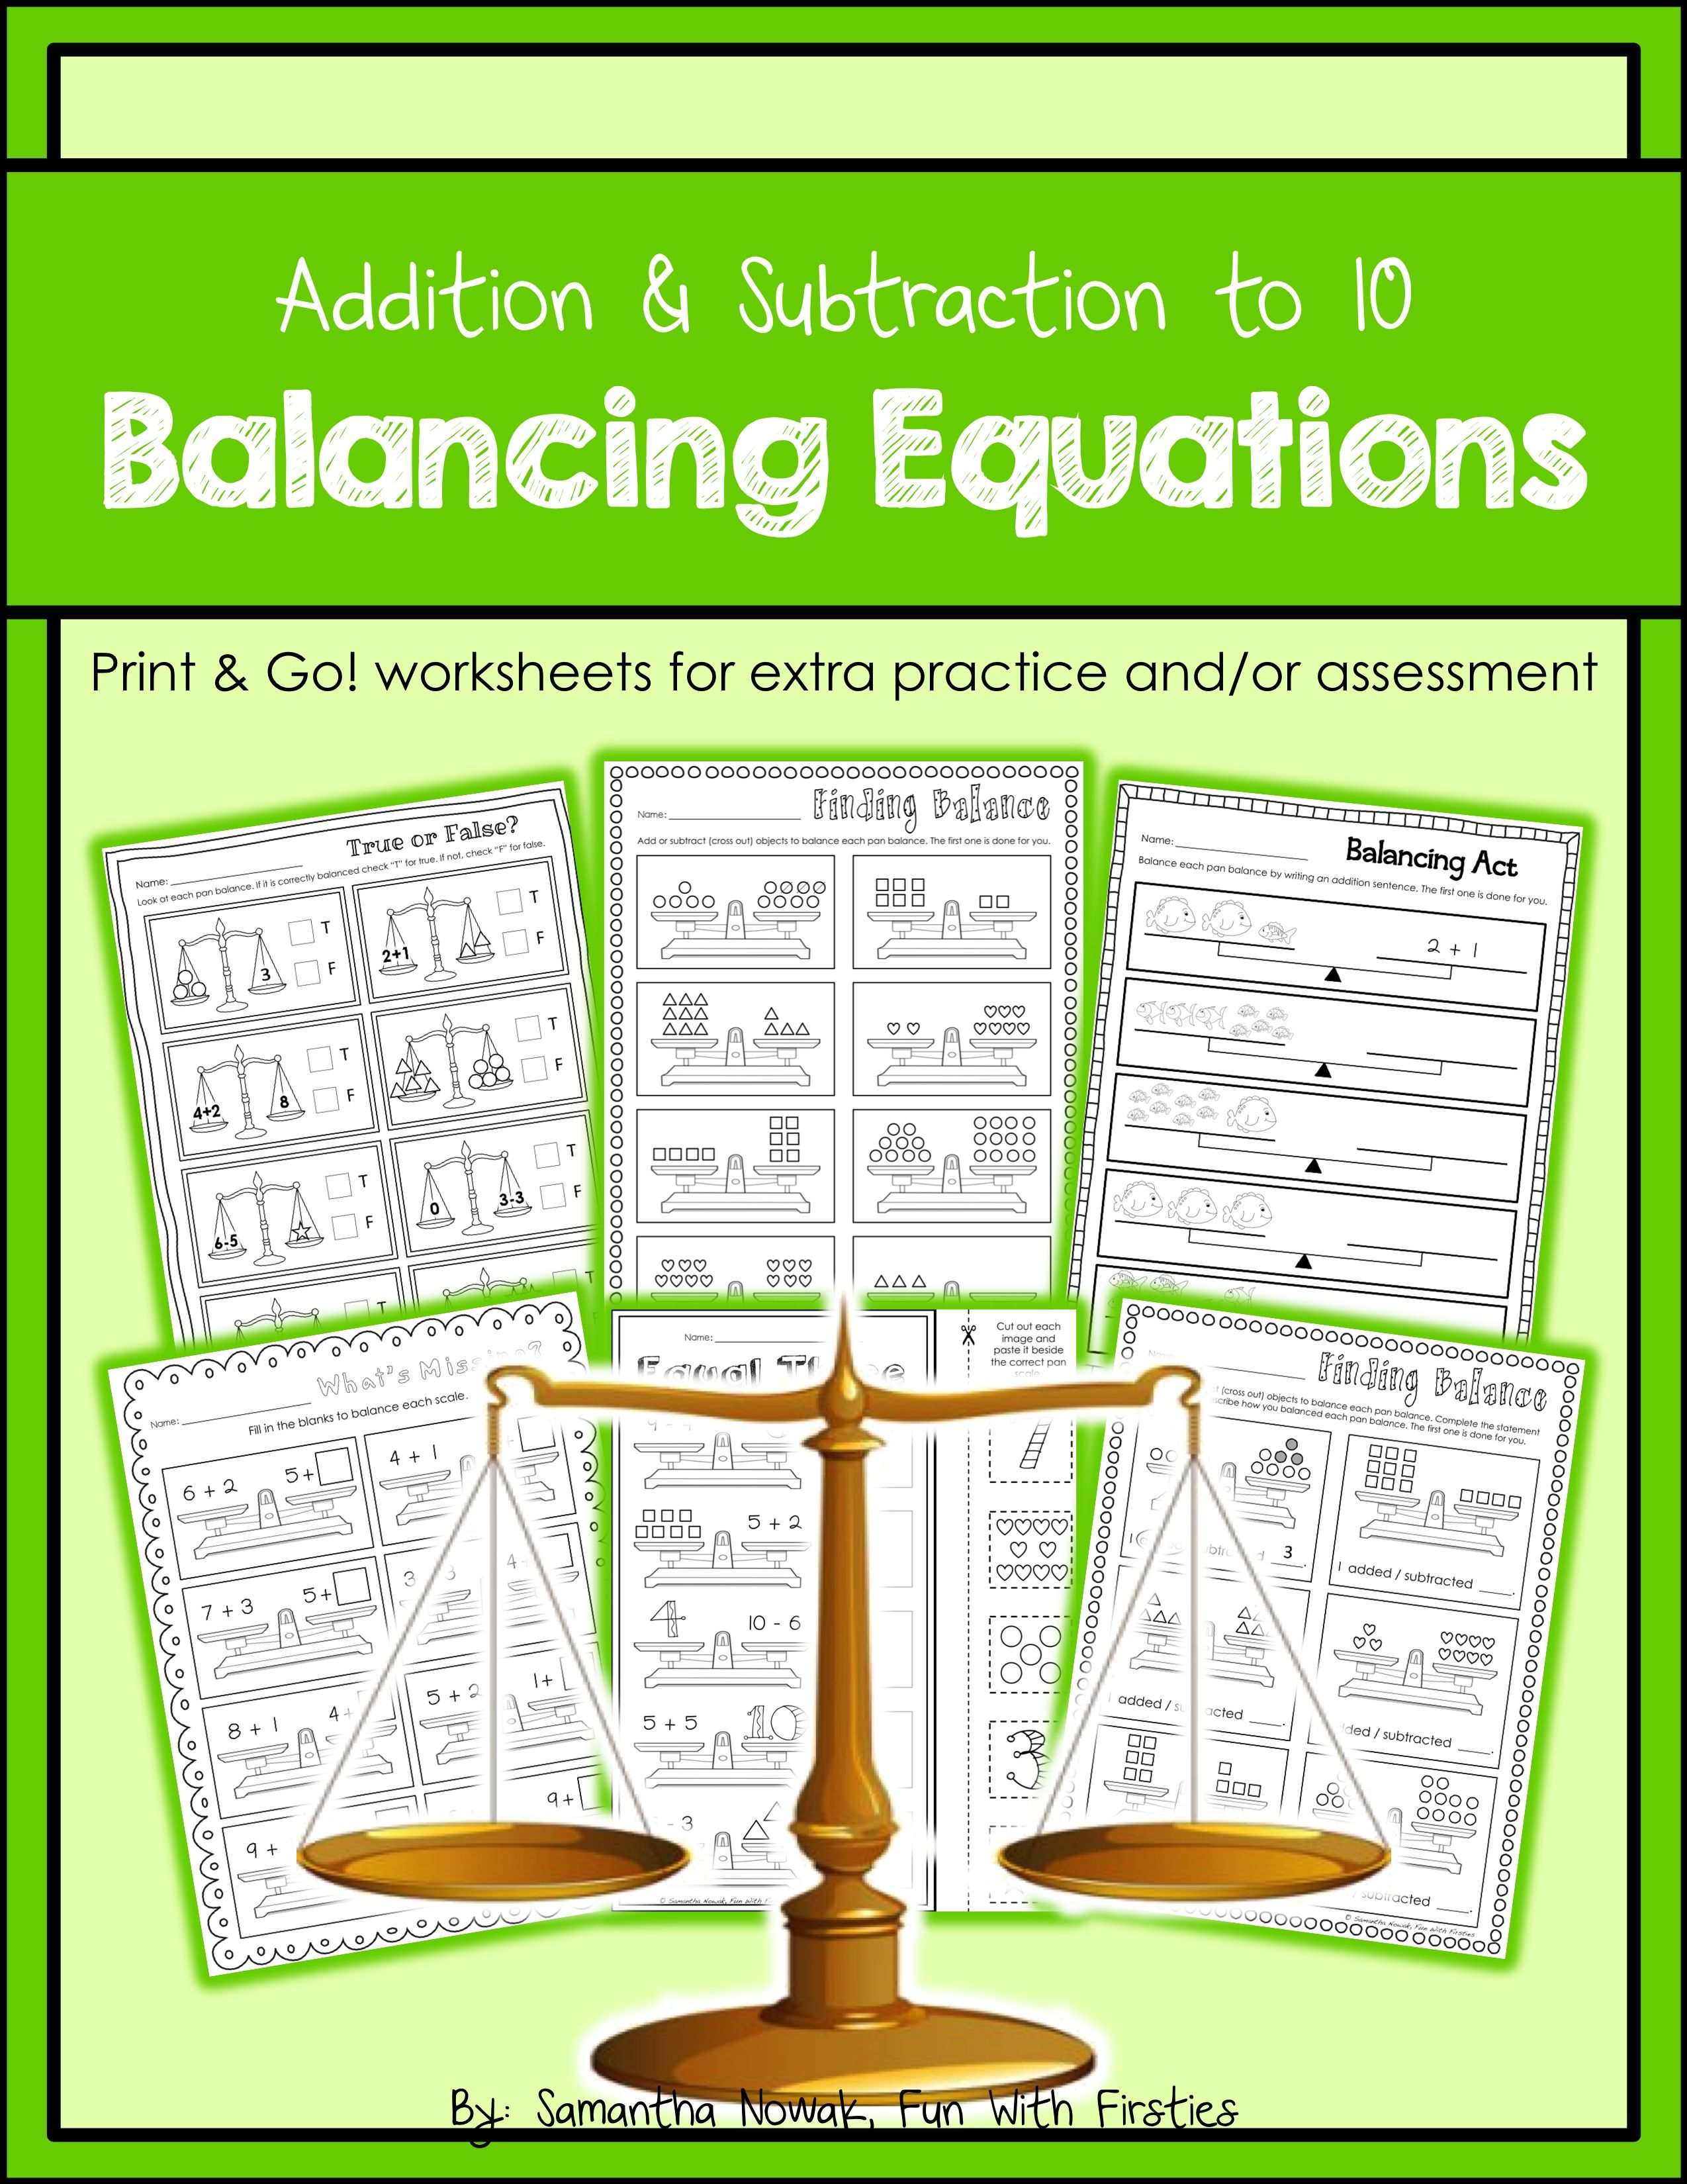 Balancing Equations Equations Balancing Equations Free Smartboard Activities Balancing addition equations game